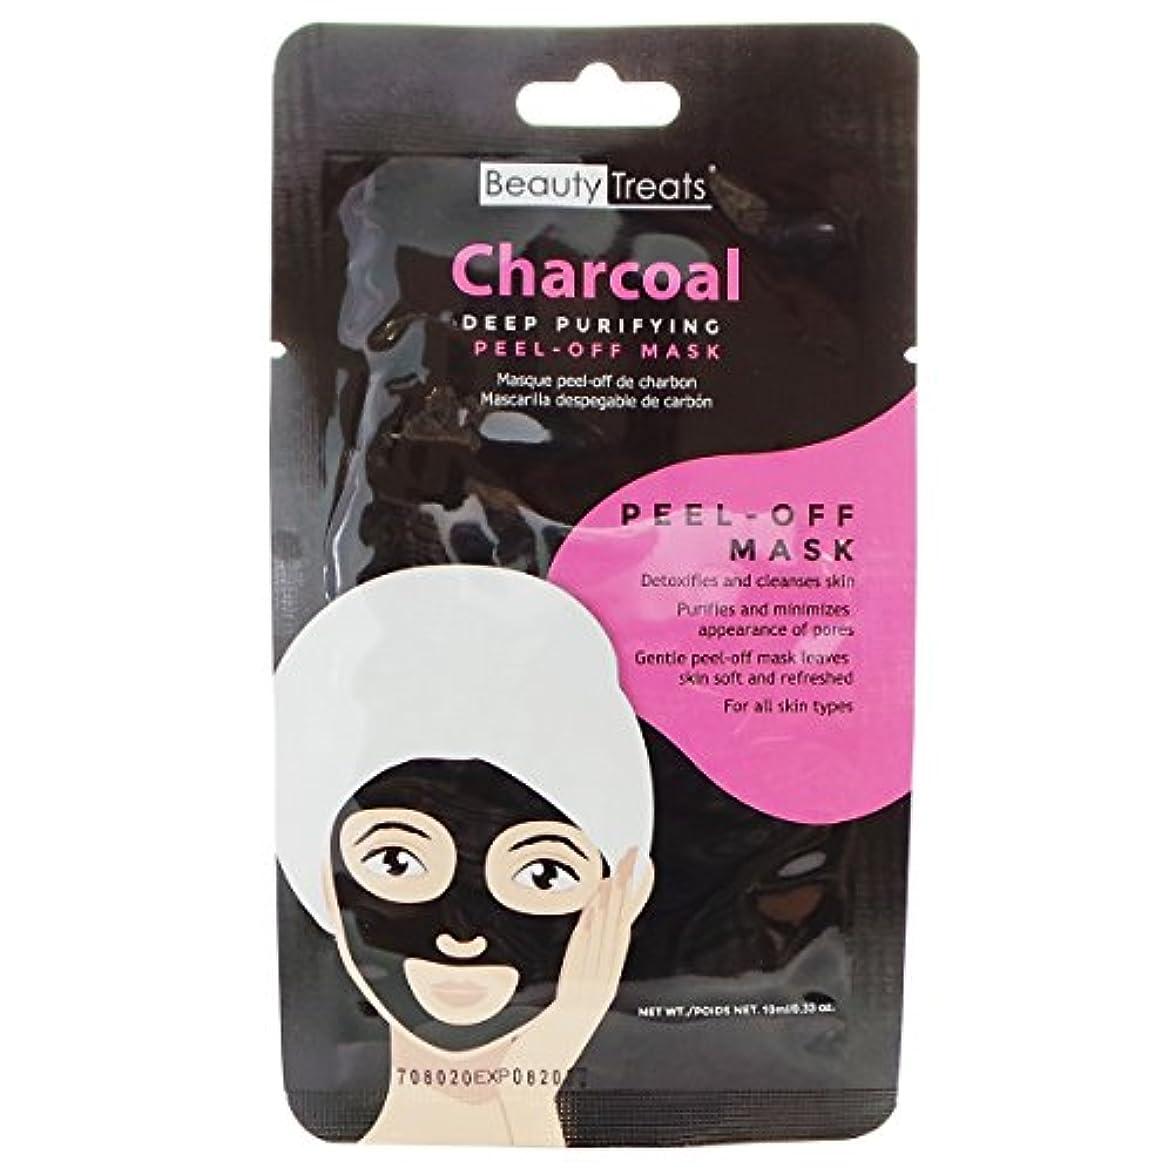 BEAUTY TREATS Deep Purifying Peel-Off Charcoal Mask (並行輸入品)